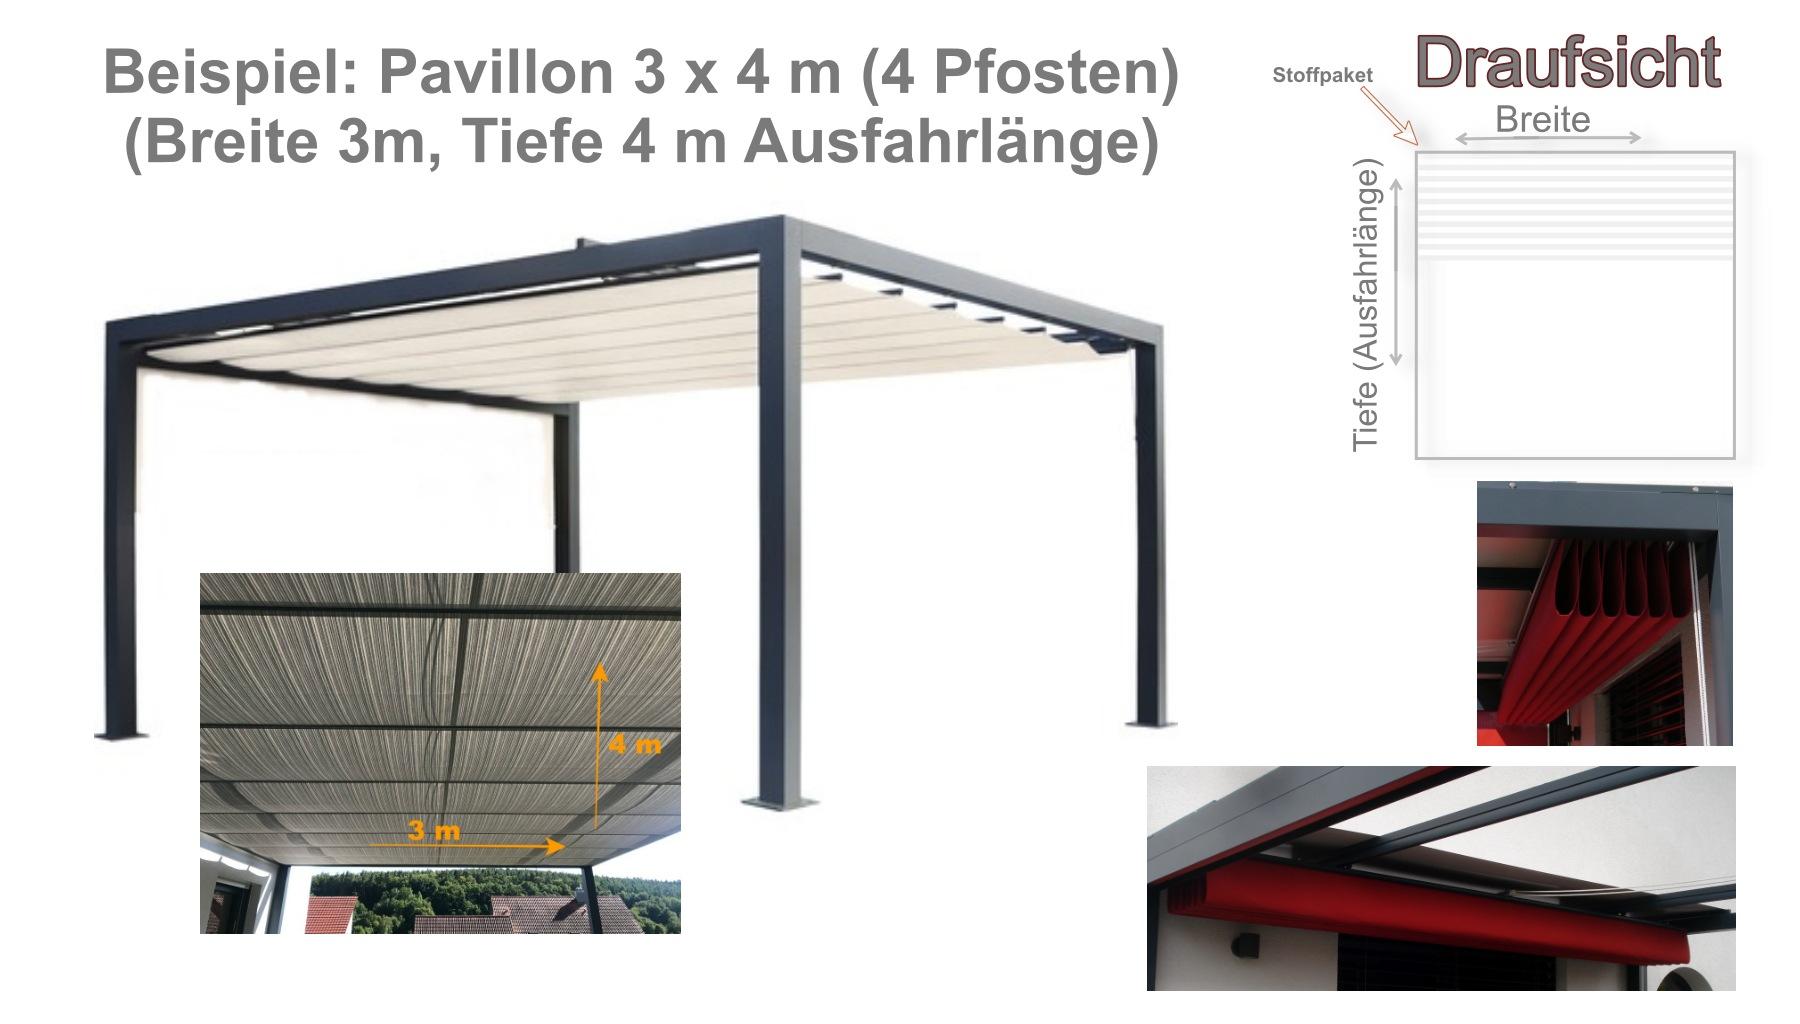 Sonnenpavillon-Massangaben-4x3h9qOo5lJIauoE